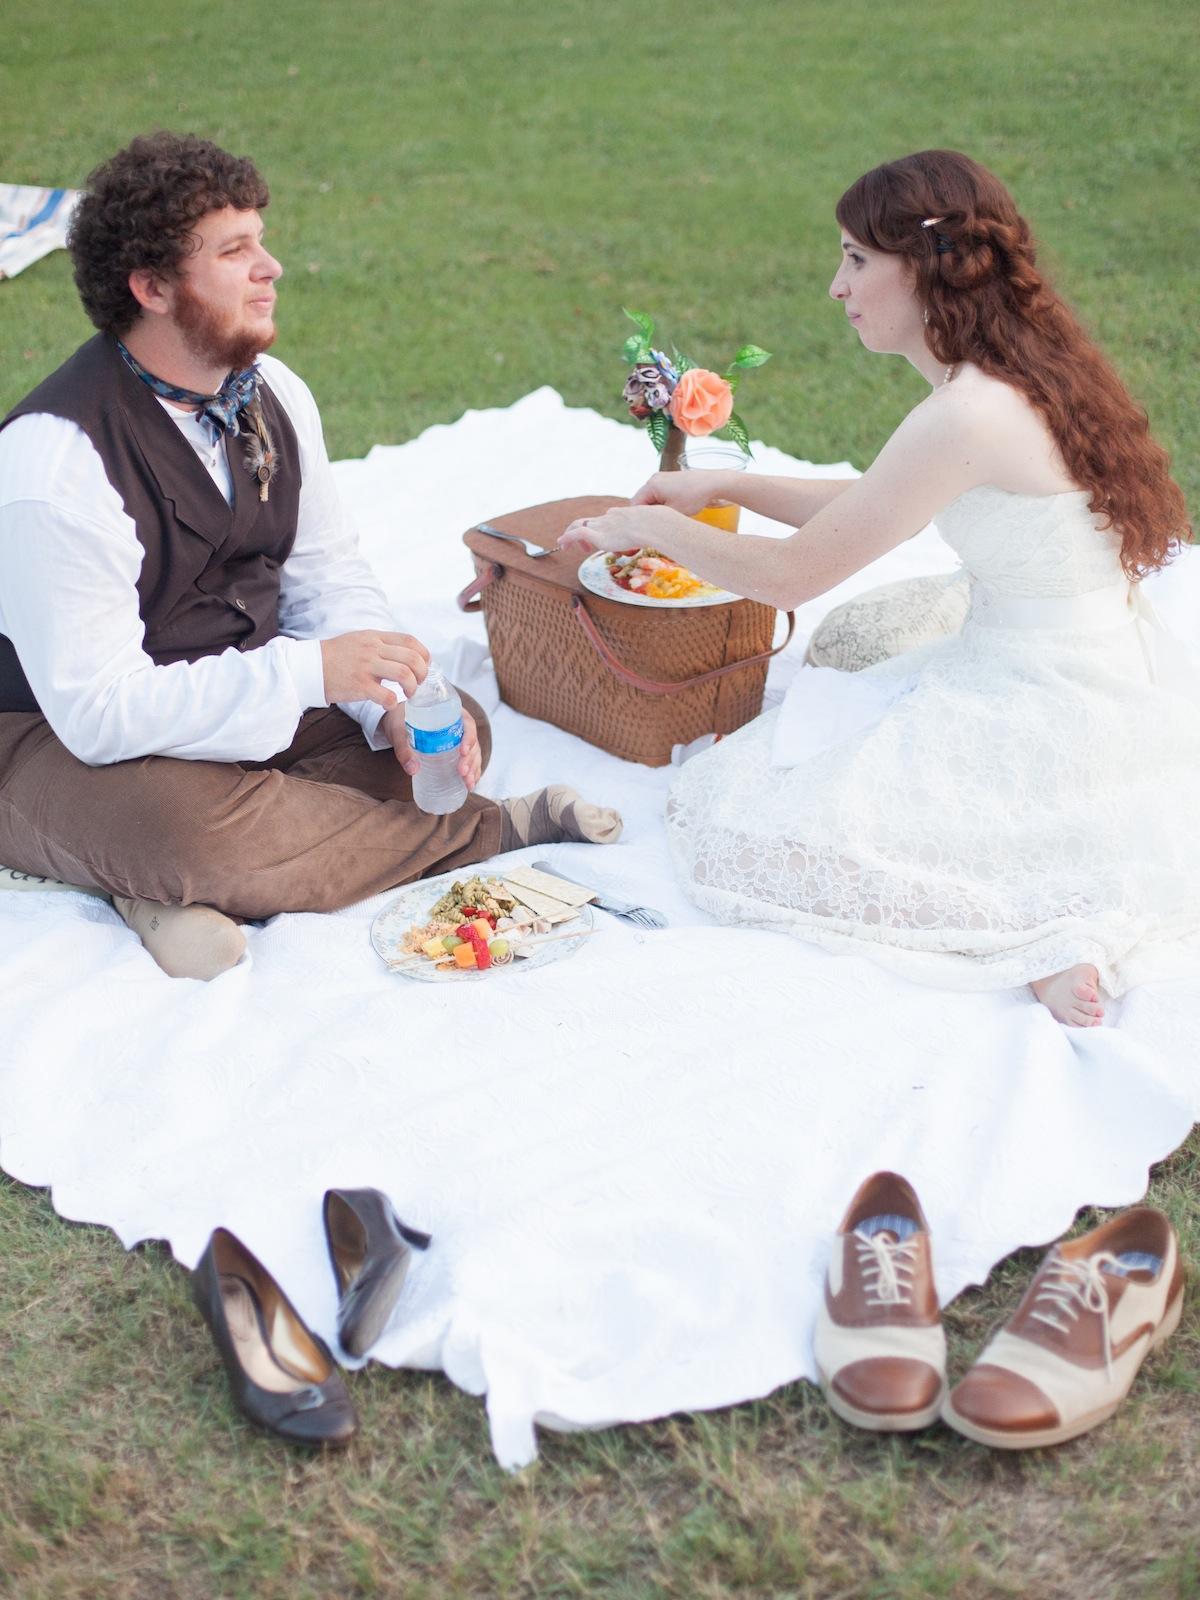 Austin-Wedding-Photographers-Photography-Wildfower-Barn-50.jpg